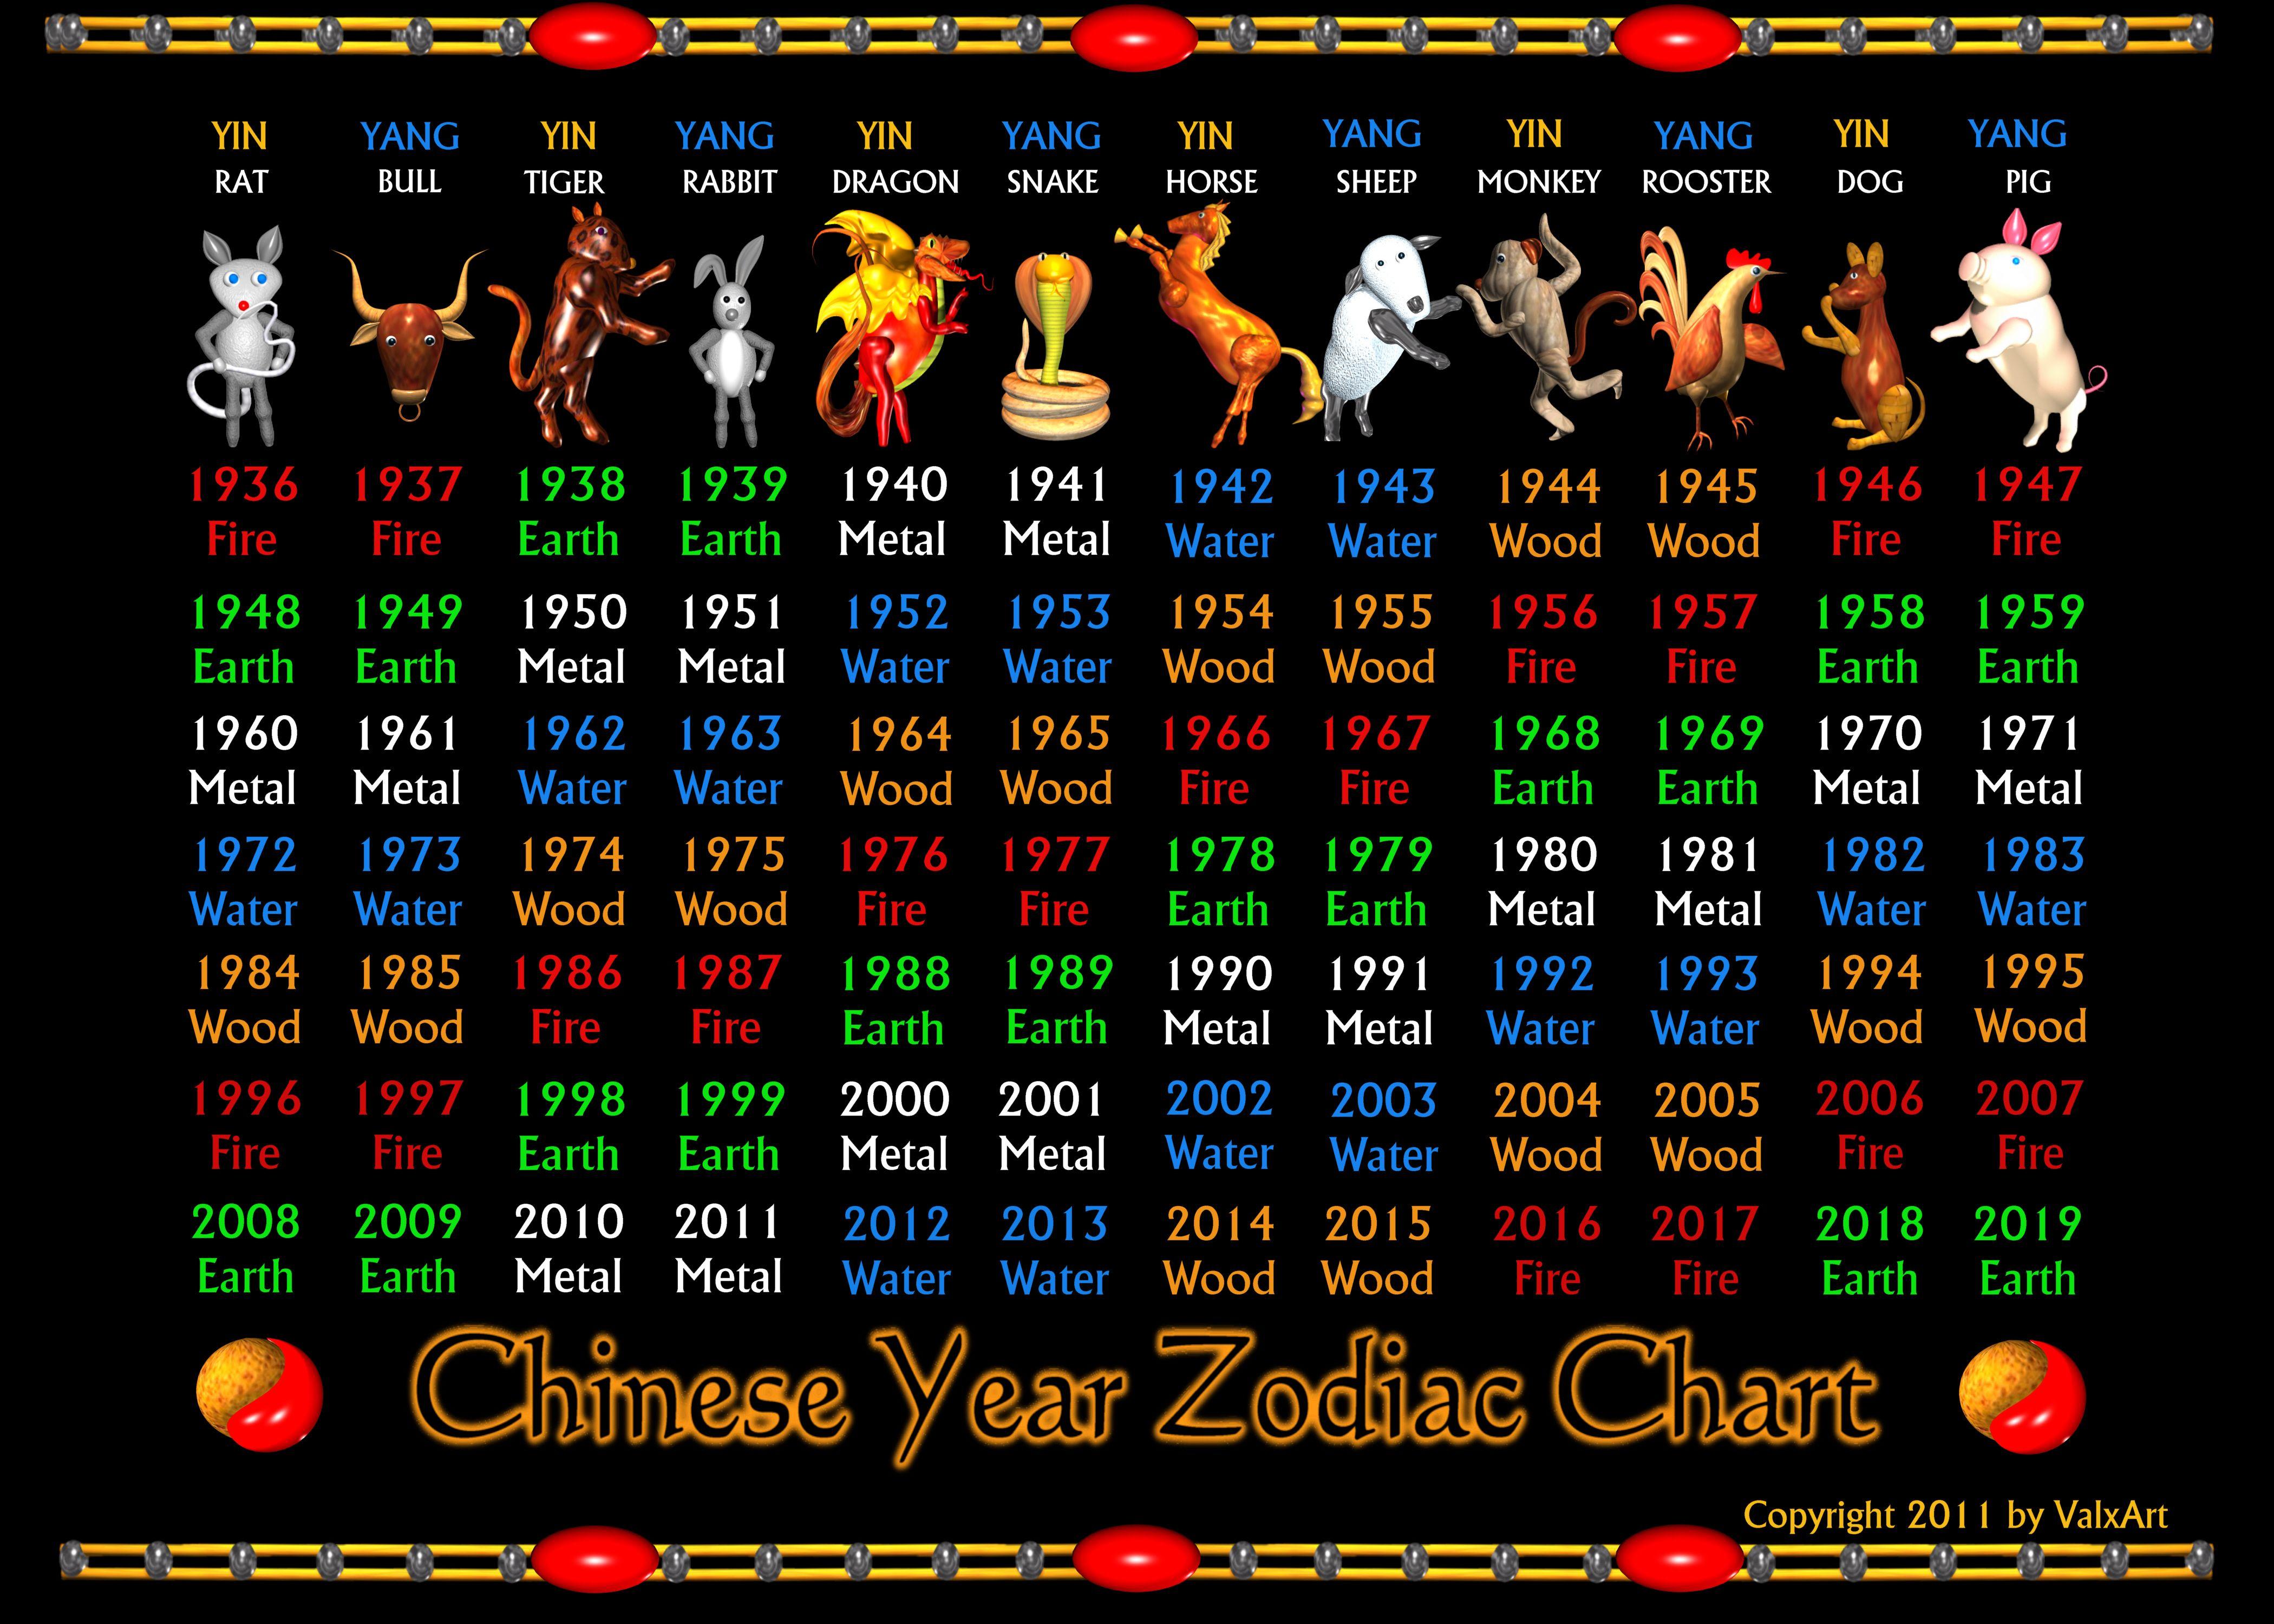 ValxArt Chinese zodiac poster 1936 to 2019 Zodiac years